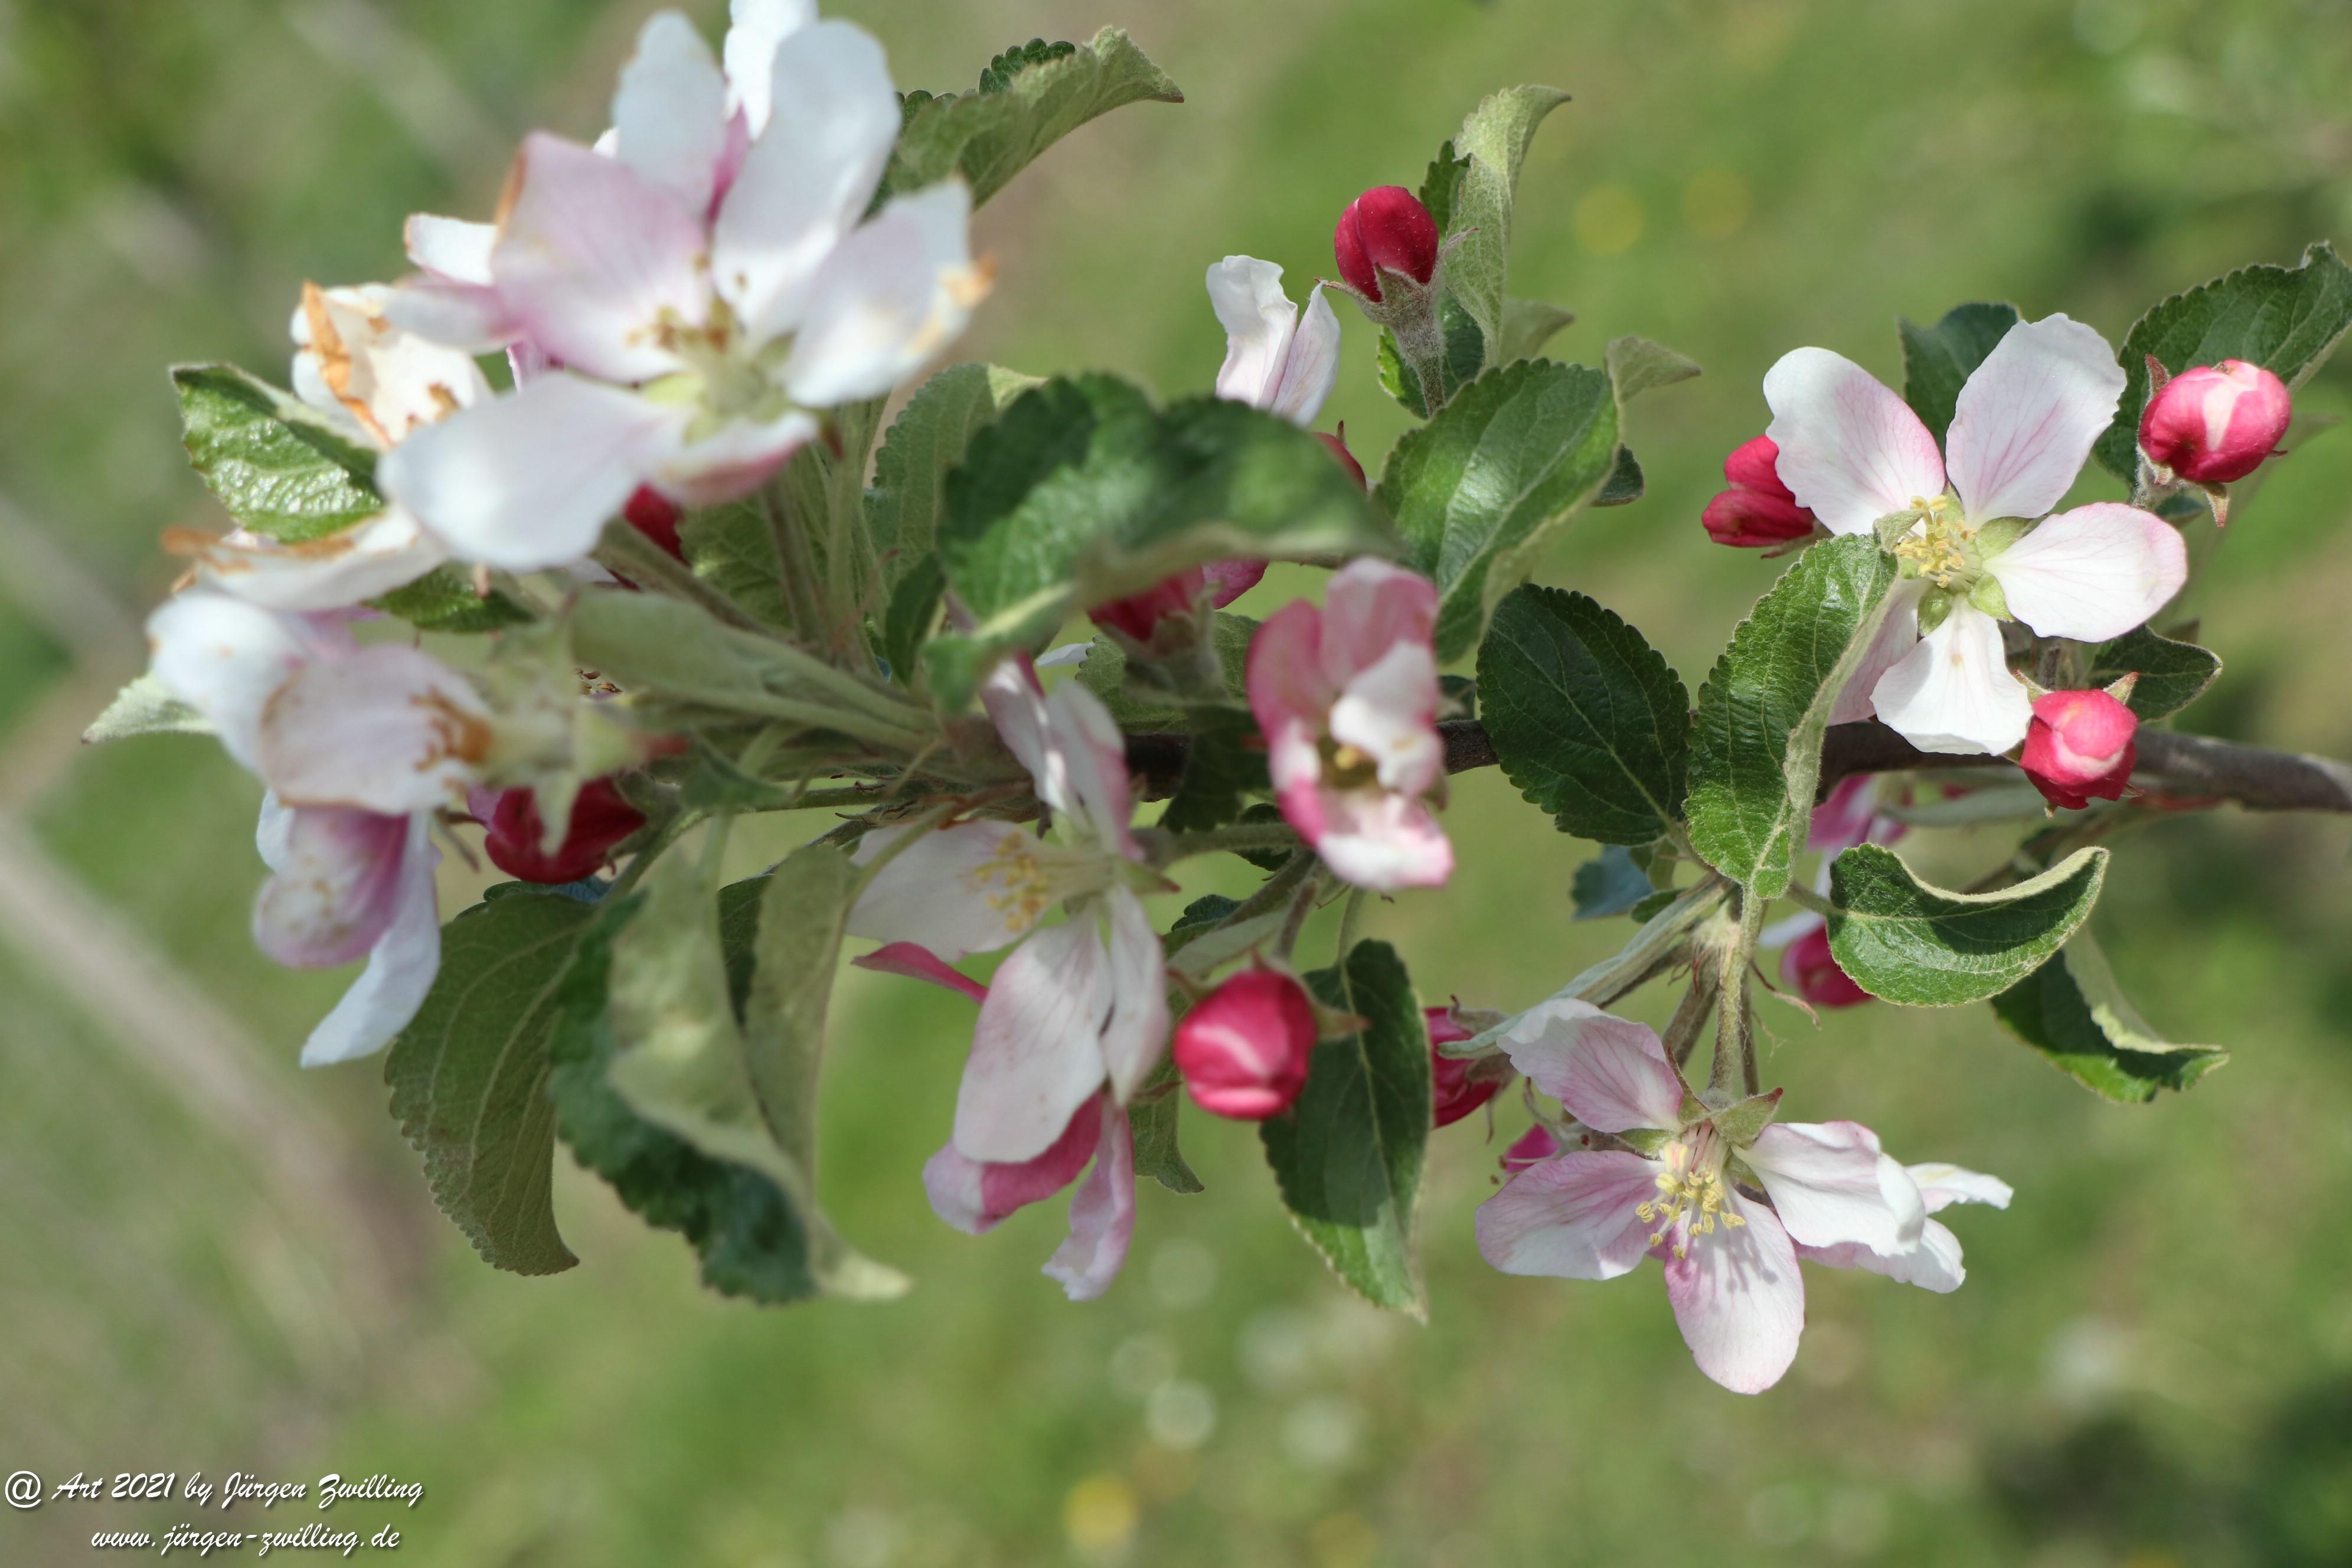 Apfelbaumblüte 6